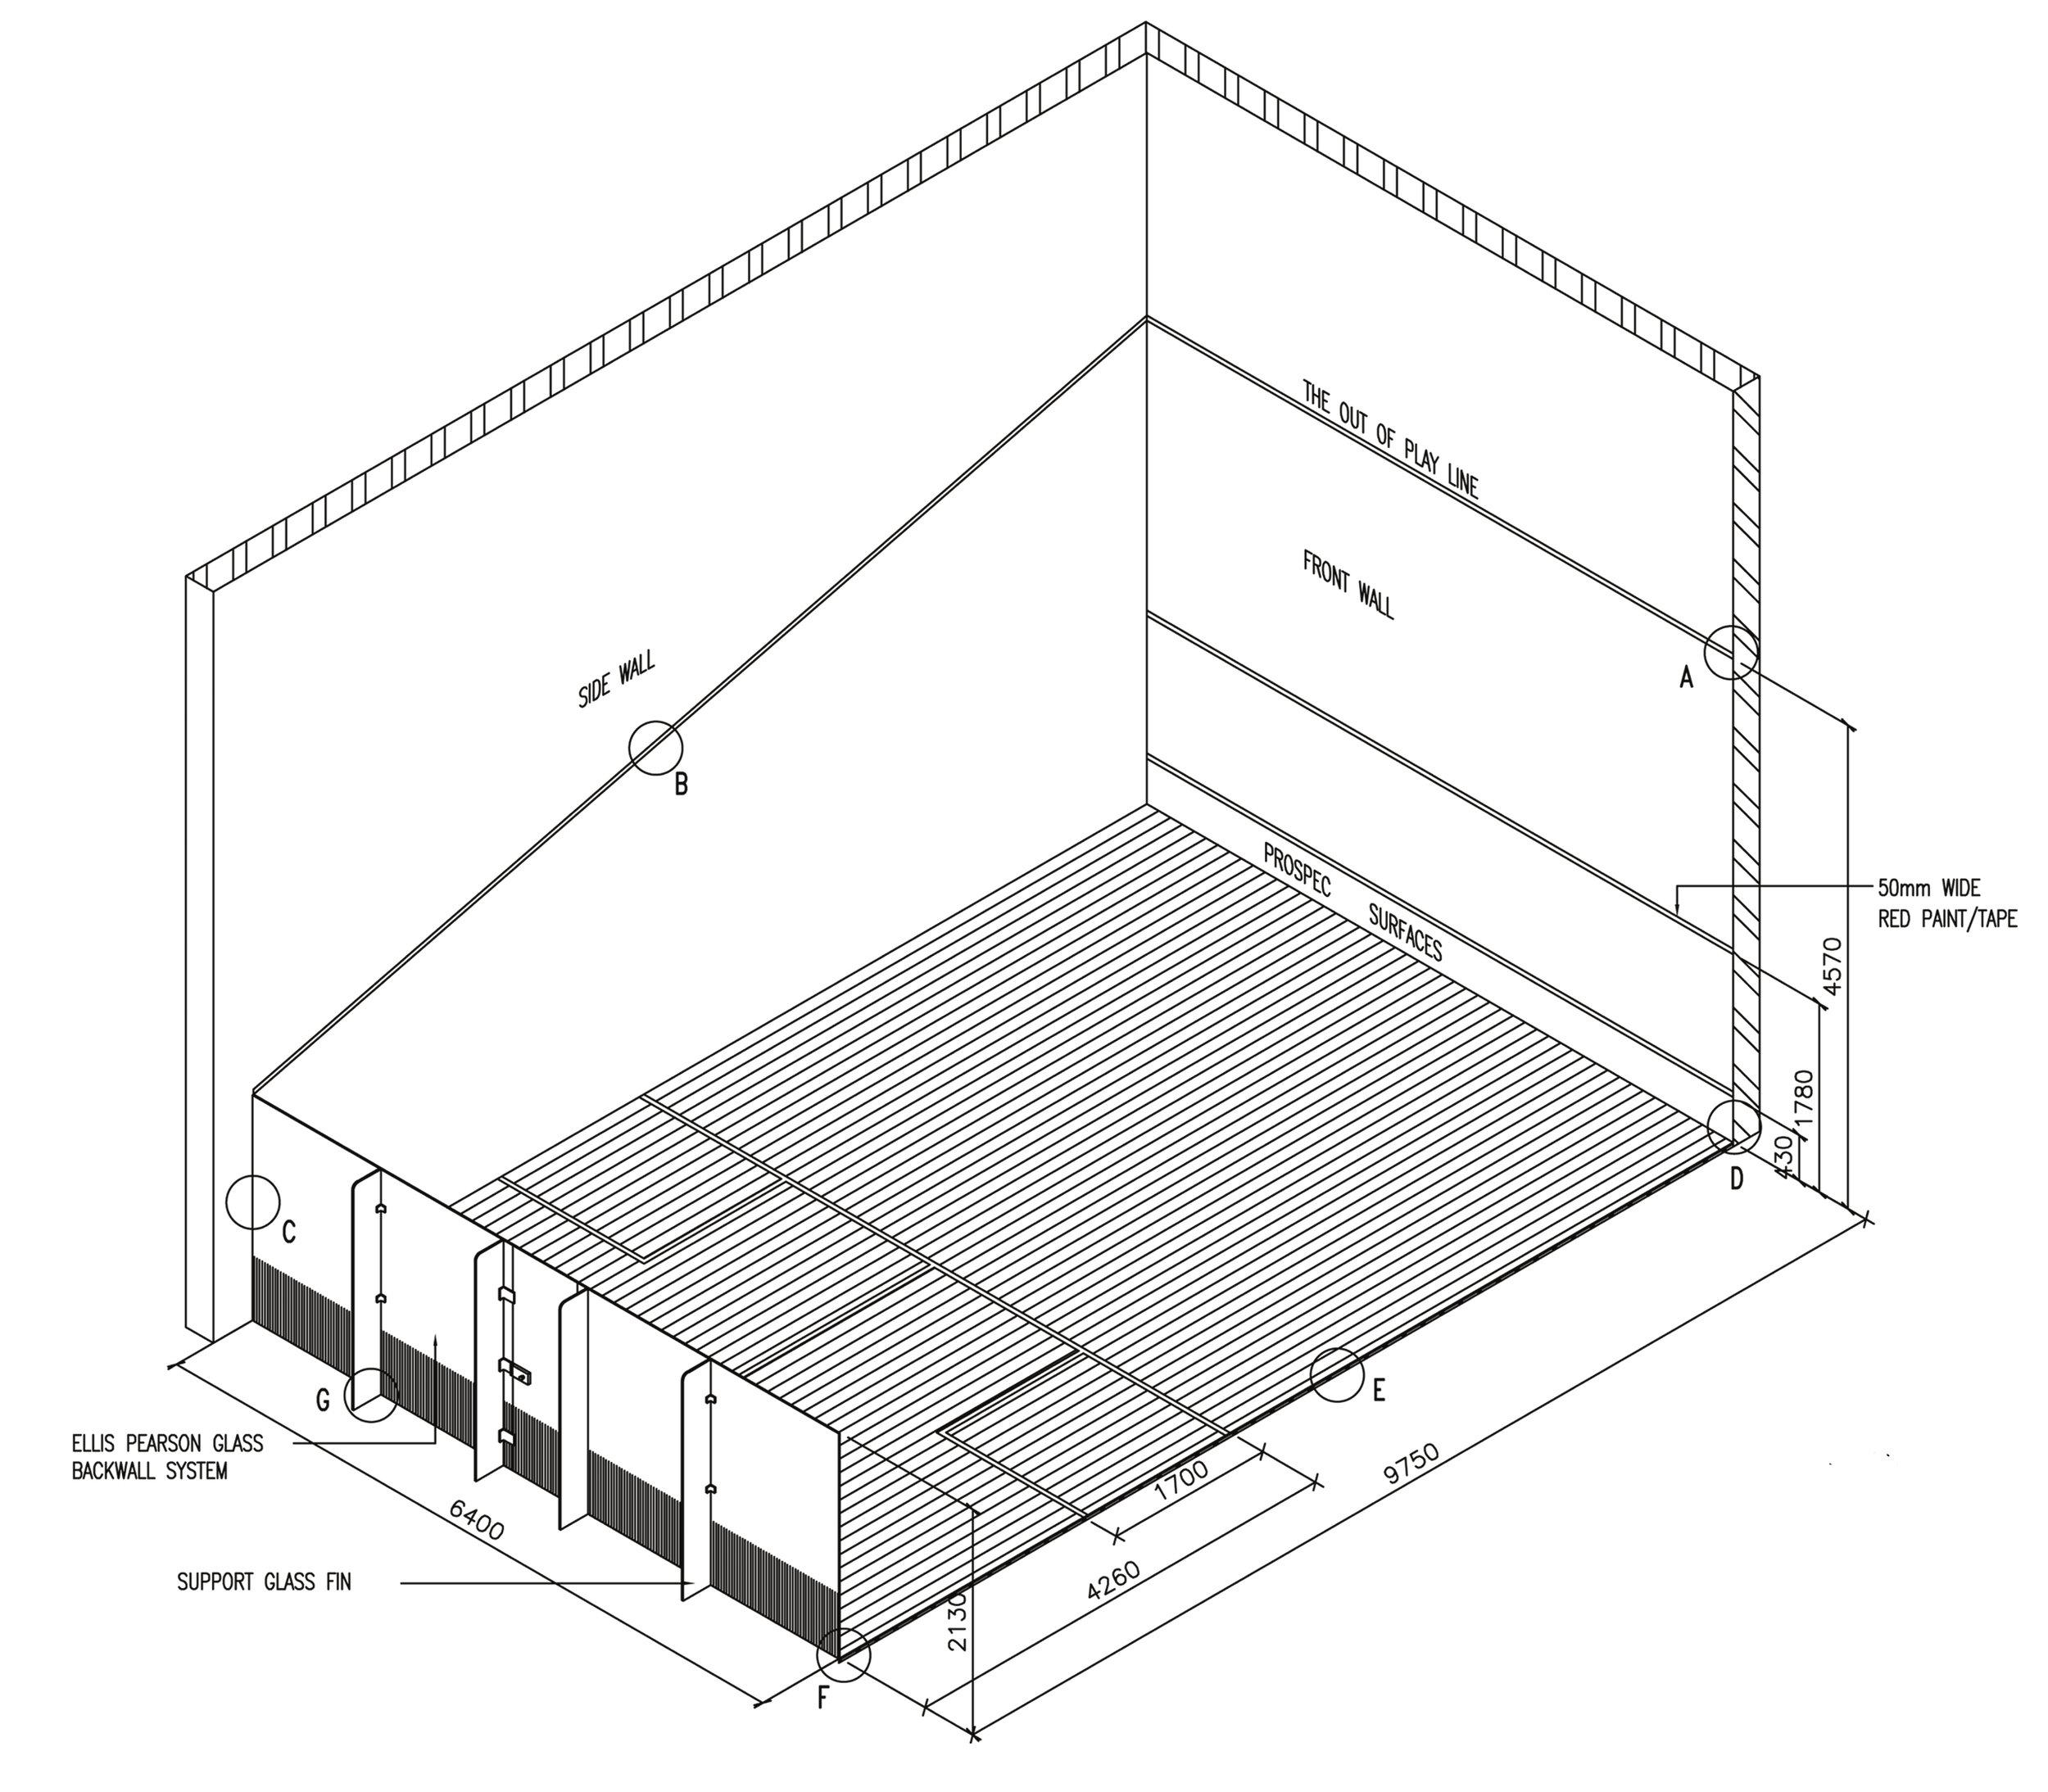 squash court diagram three line solar courts prospec surfaces dwg jpg